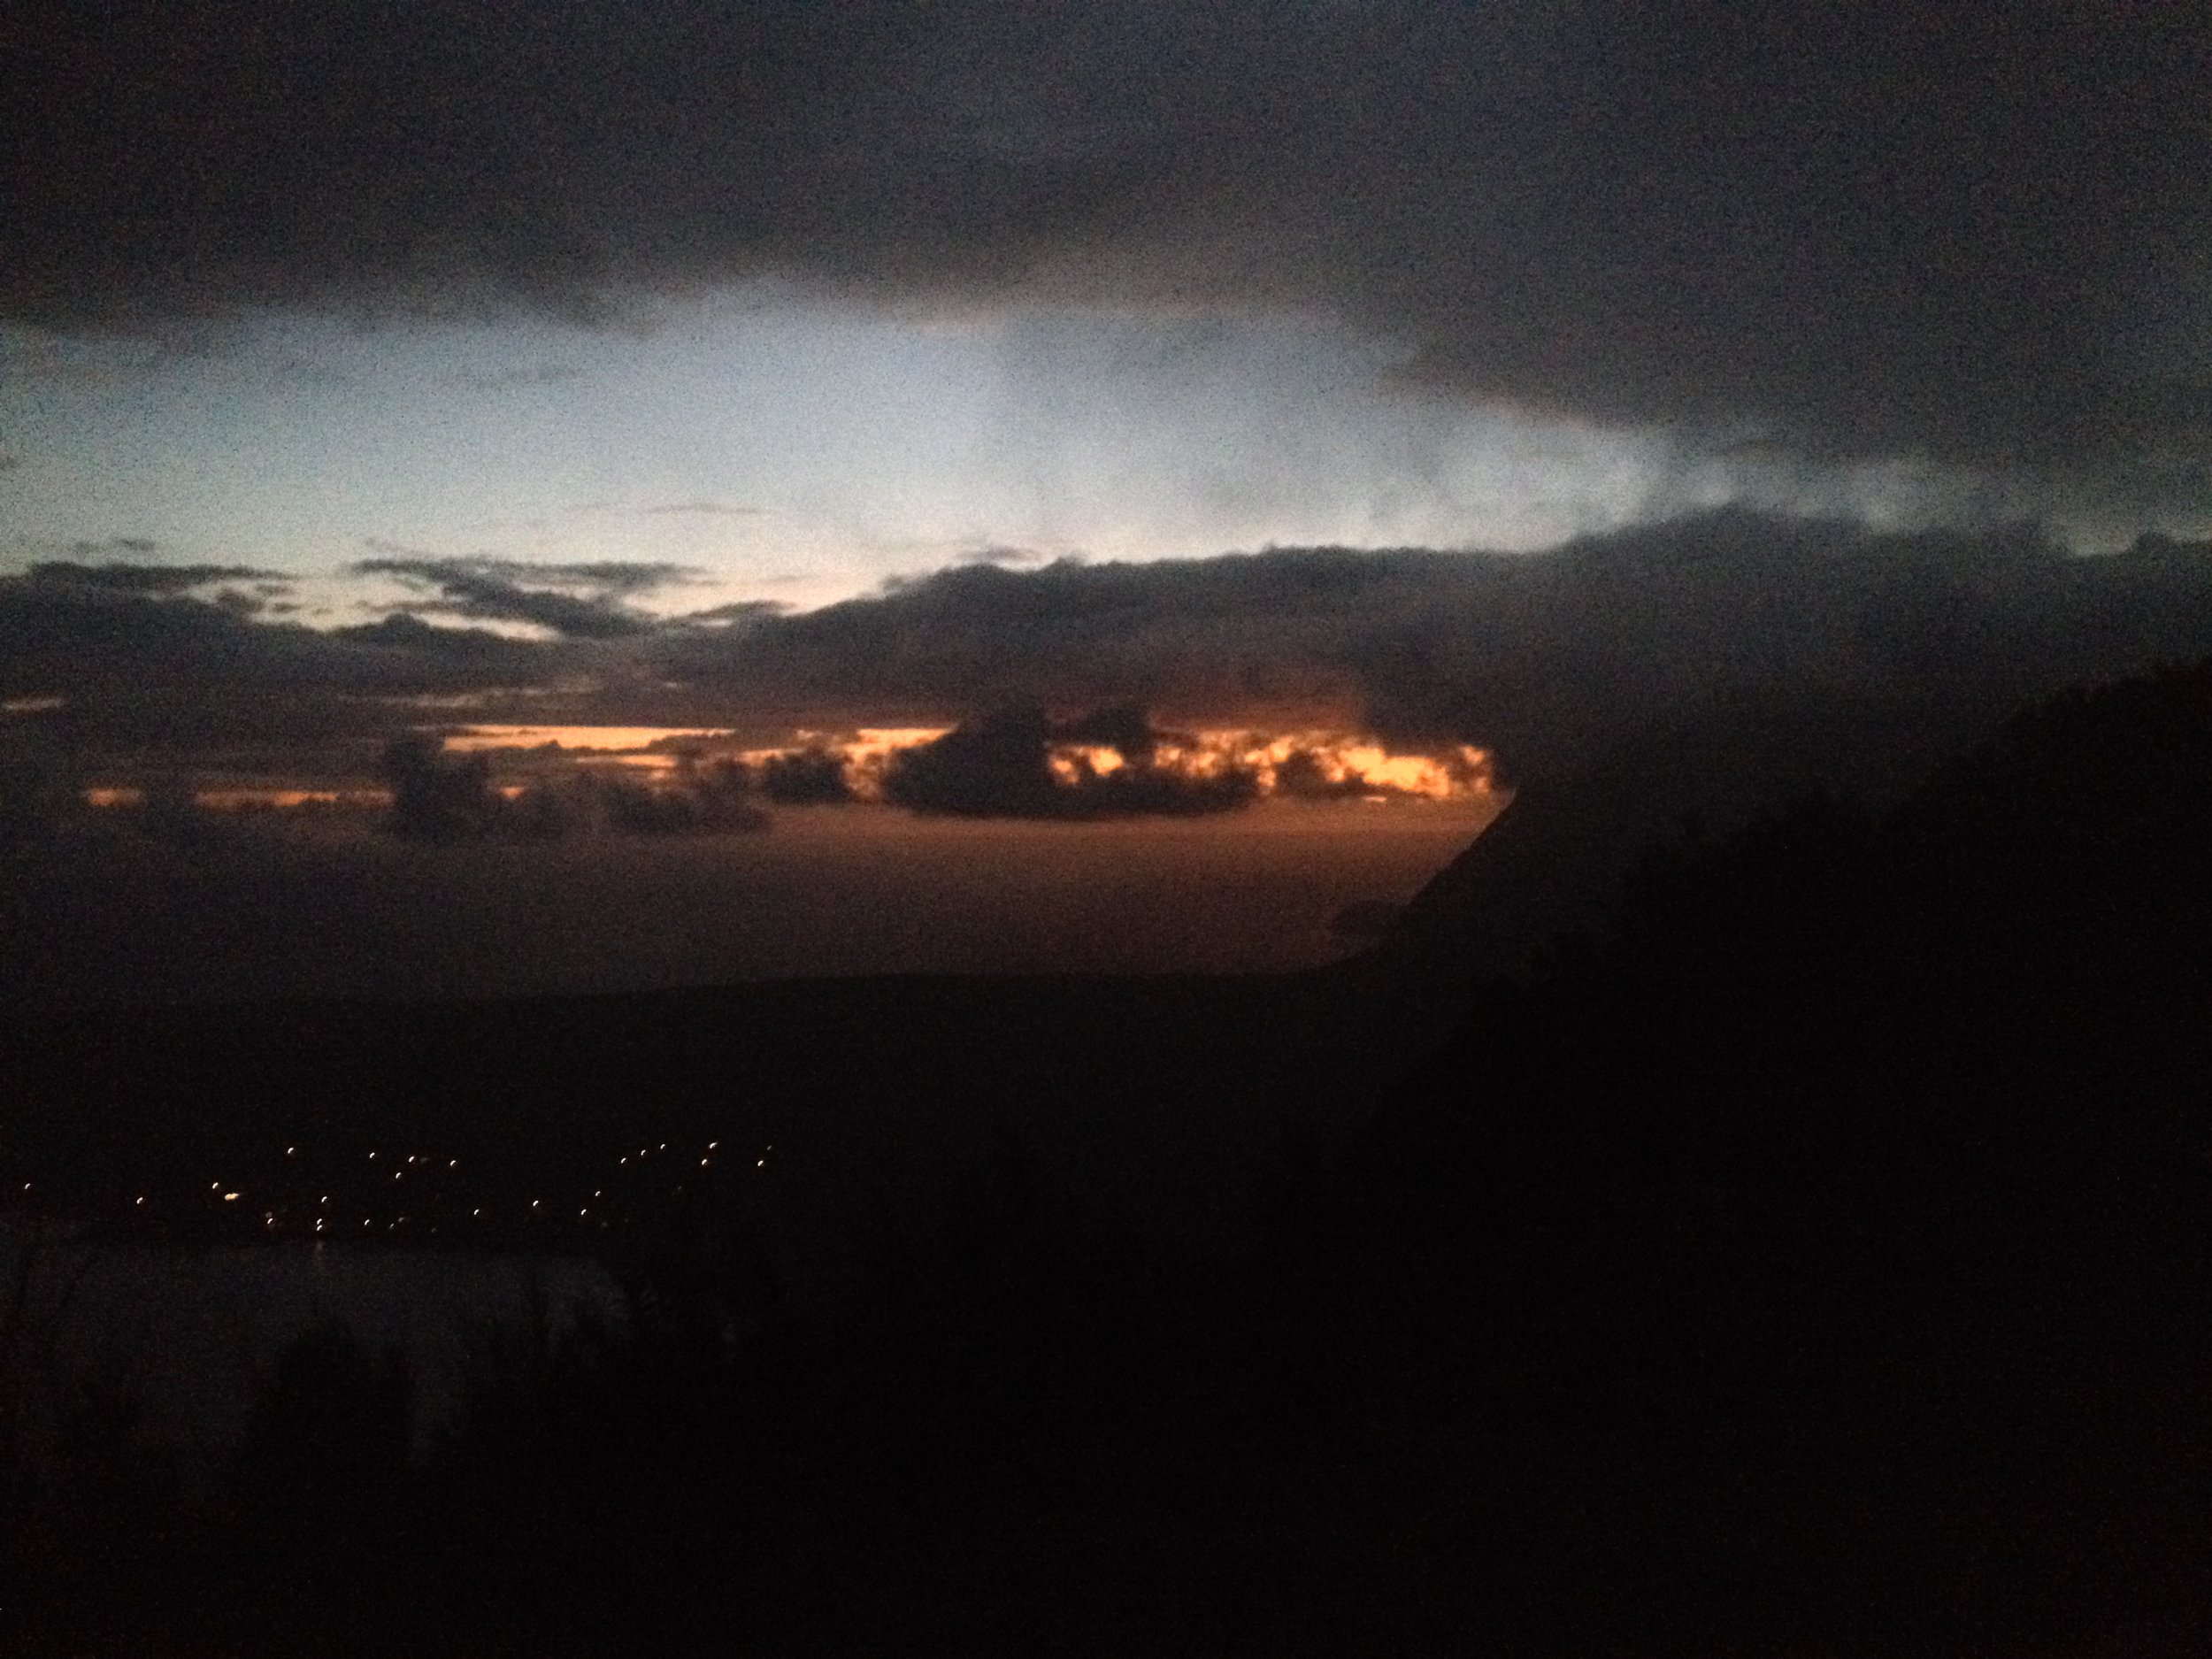 Sunrise as I watched it from the Kalaupapa Overlook on the island of Molokai, Hawaii.